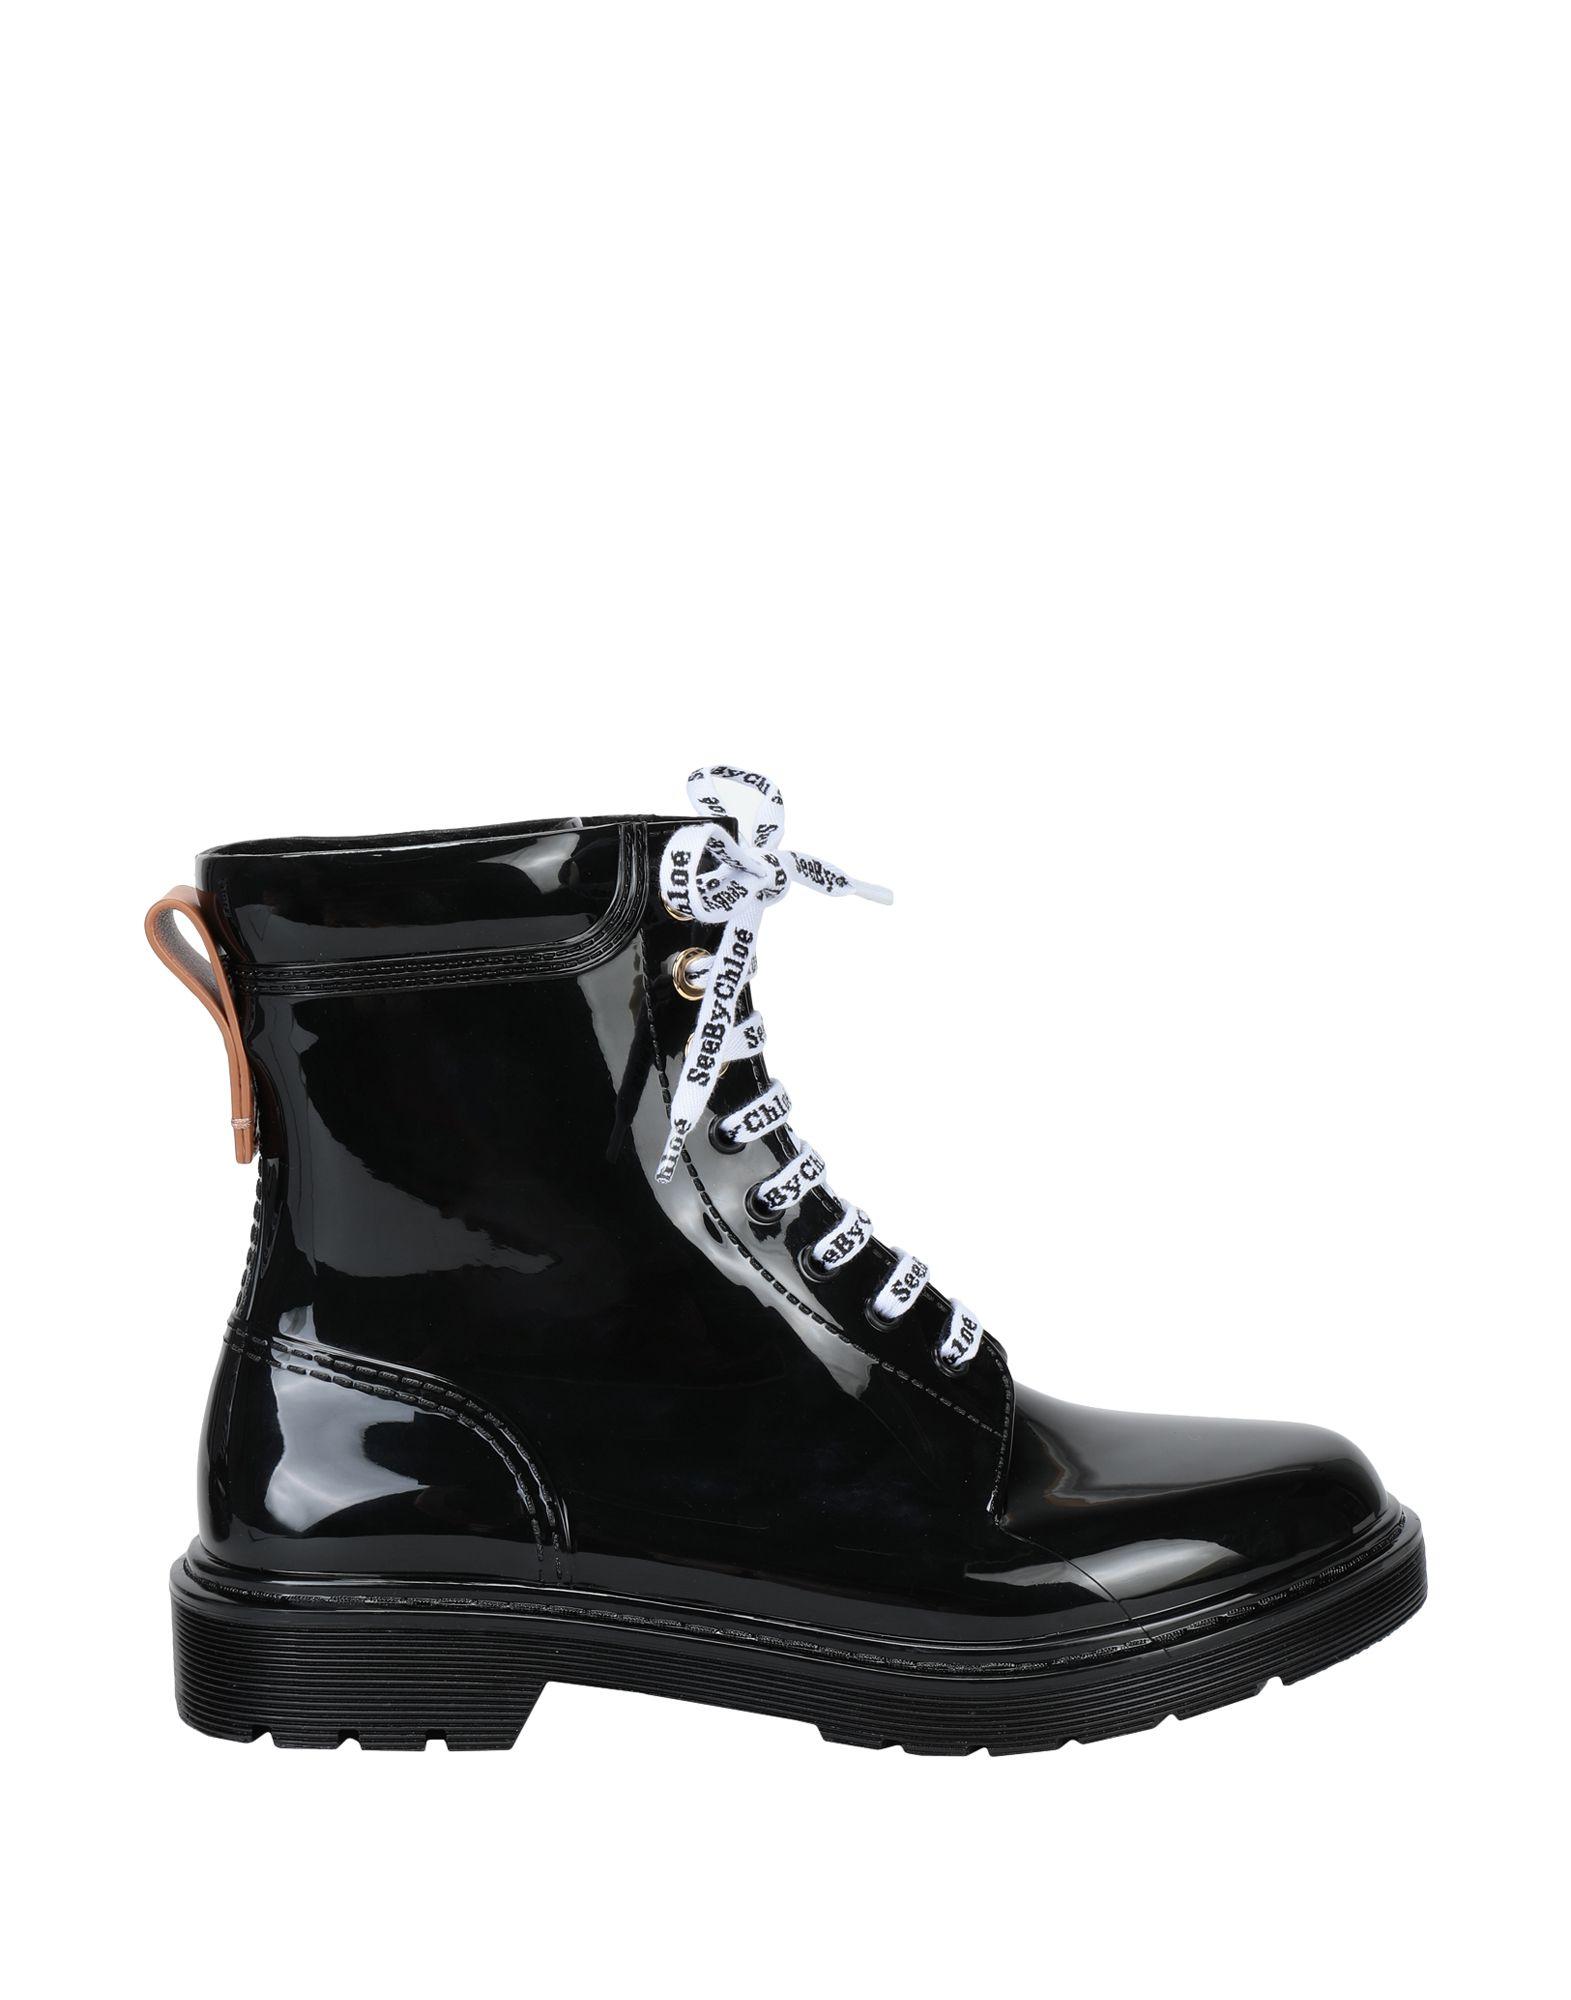 SEE BY CHLOÉ Полусапоги и высокие ботинки h by hudson полусапоги и высокие ботинки